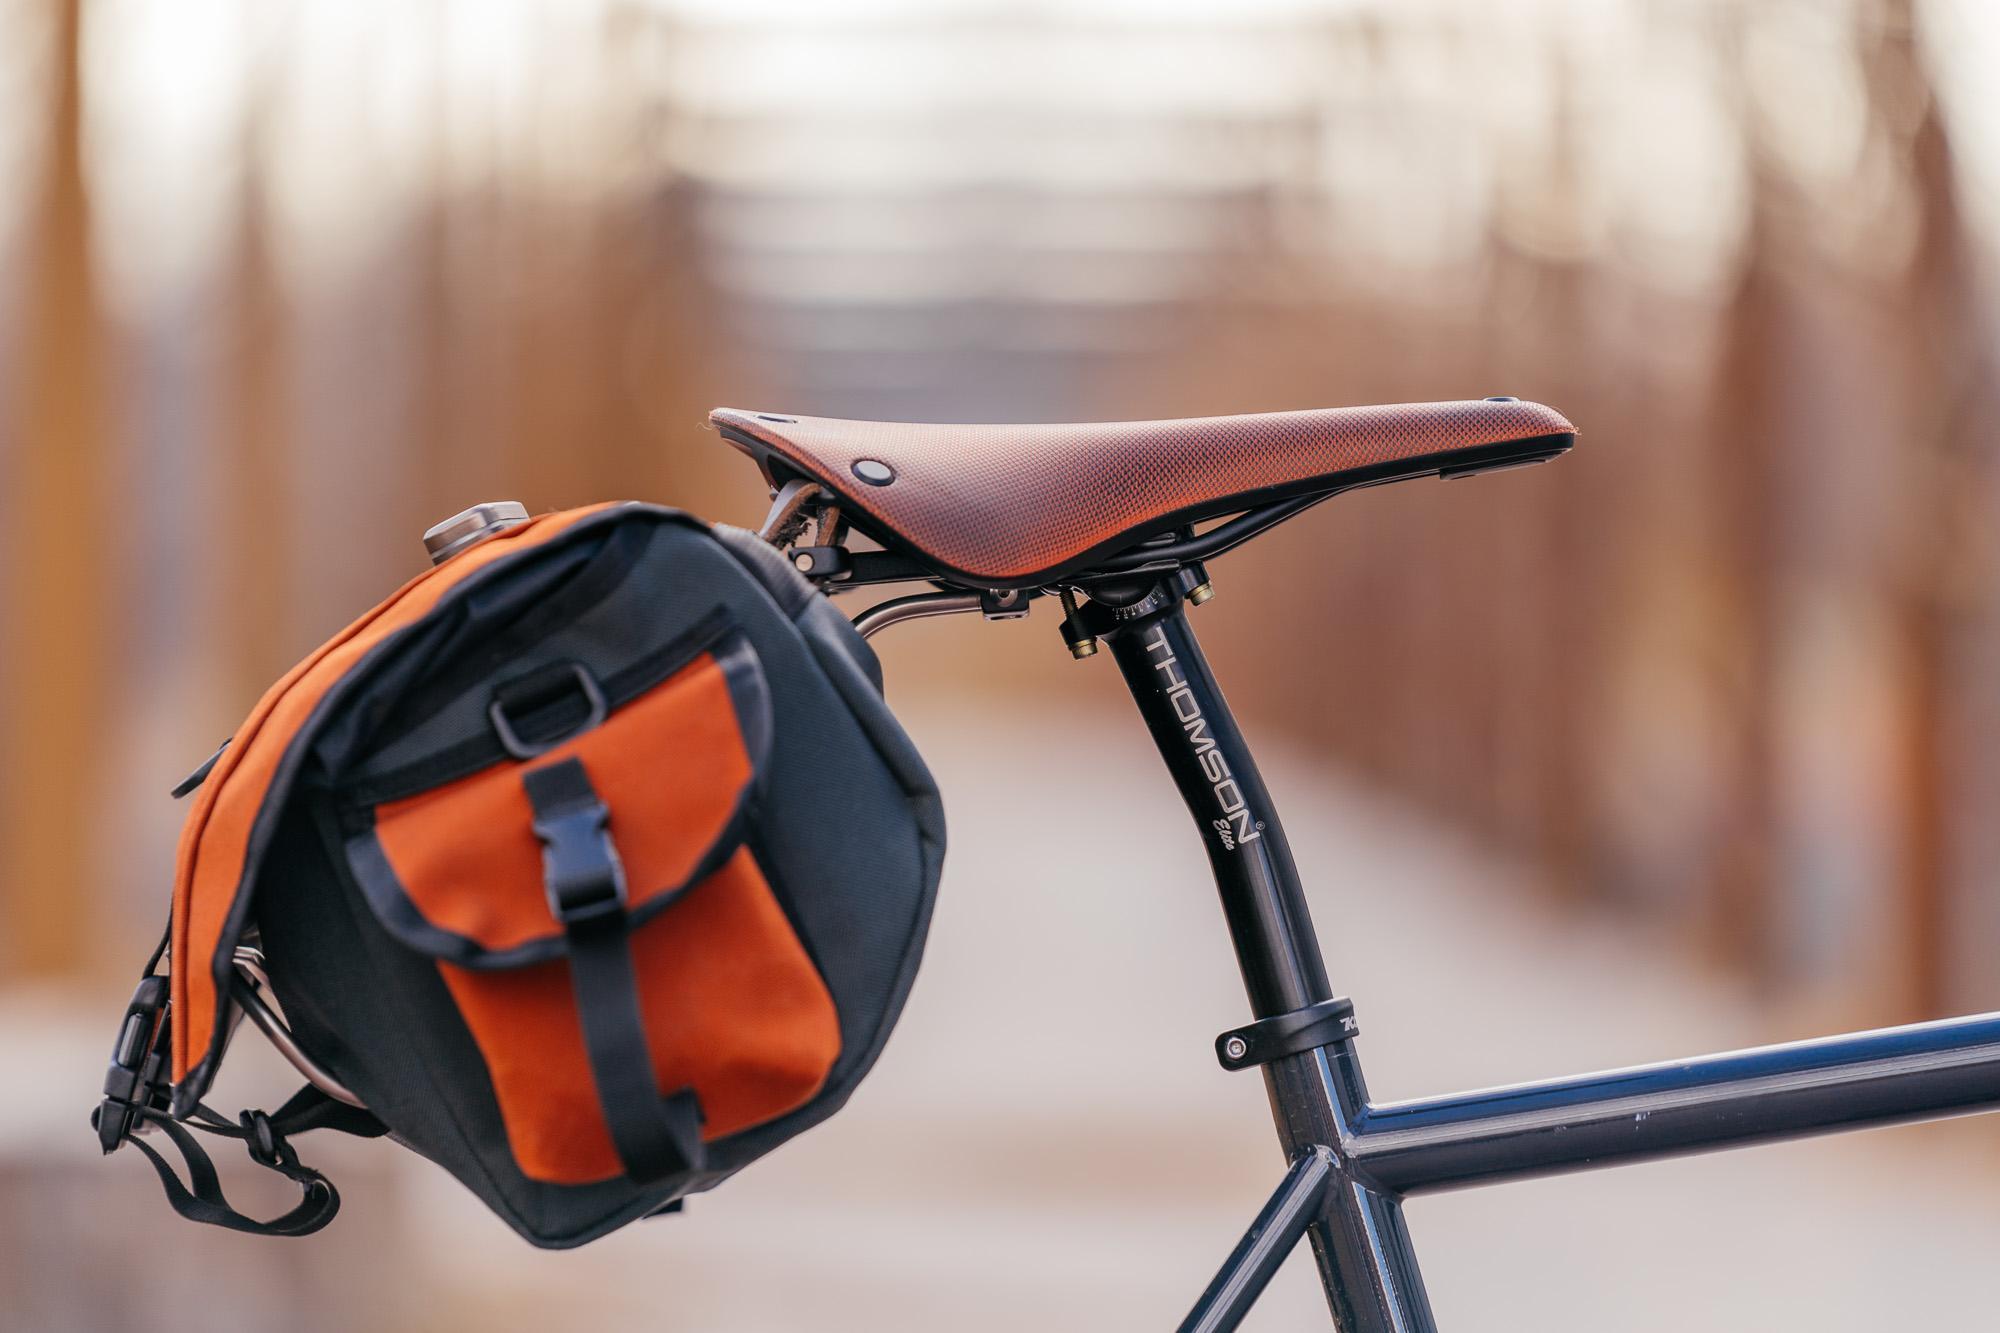 Kyle's Swift x Kona Rove ST Special Edition Touring Bike